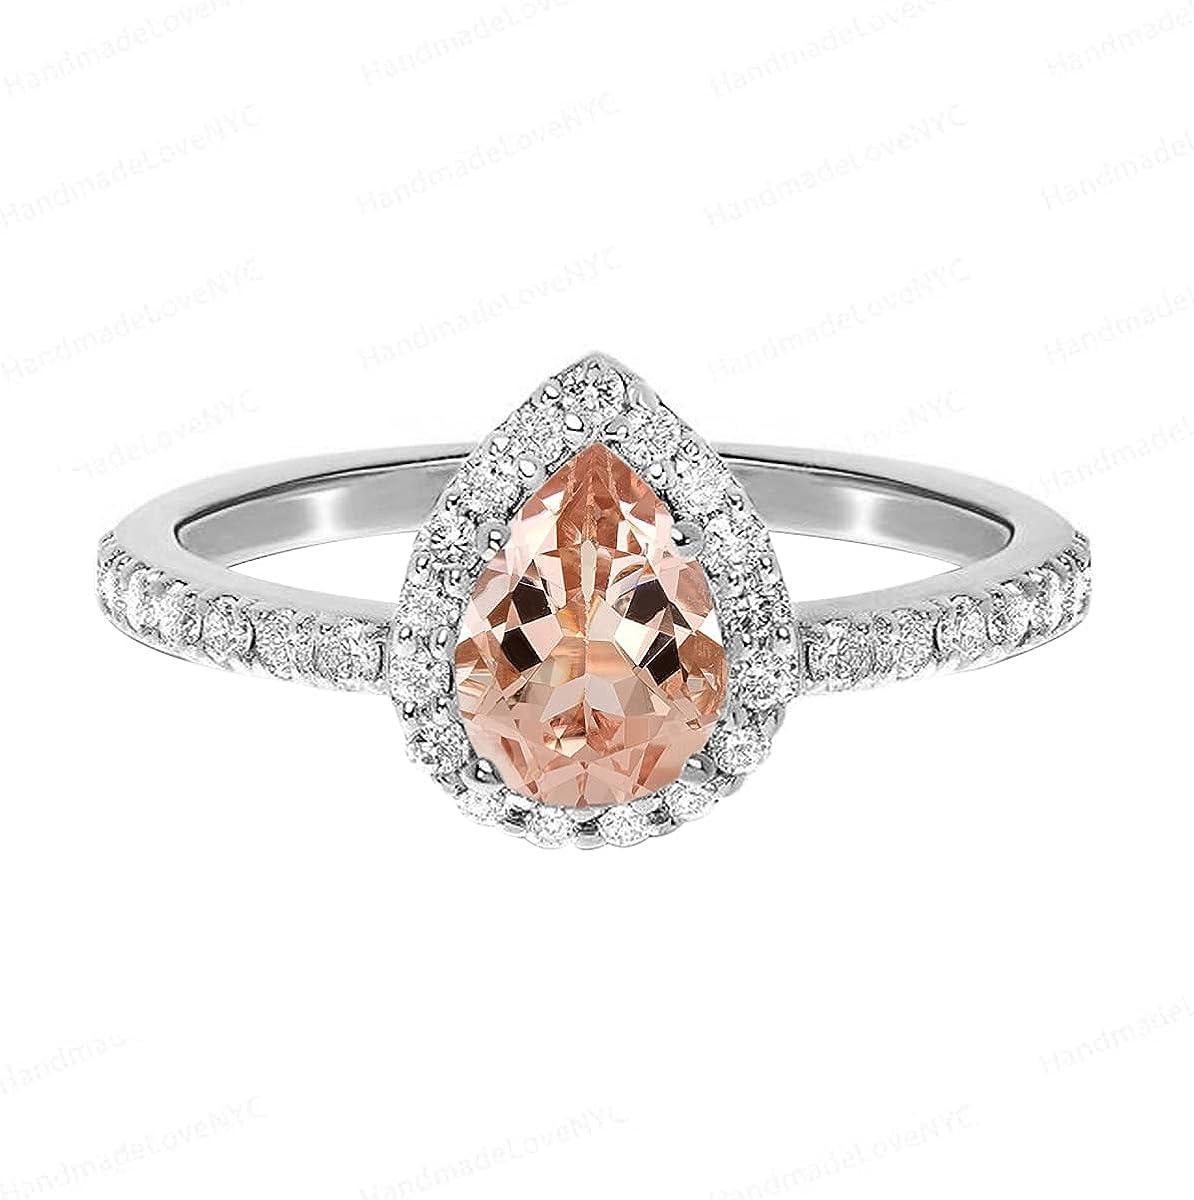 Shine Jewel 7X5 MM Latest item Pear Silver Gemstone Luxury Solitaire Morganite 925